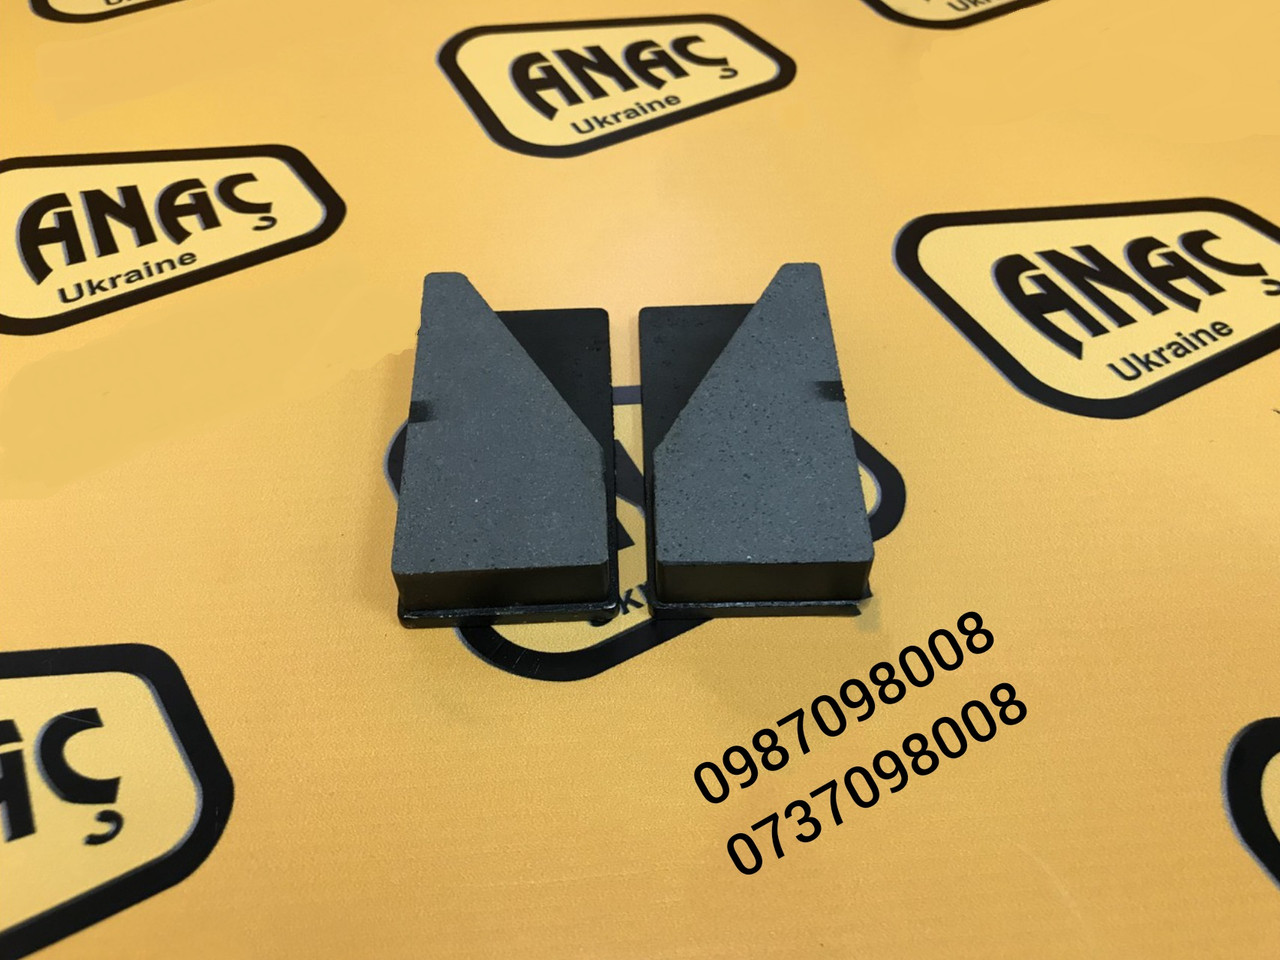 Комплект тормозных колодок на JCB 3CX, 4СХ,  номер : 15/920160, 452/02700